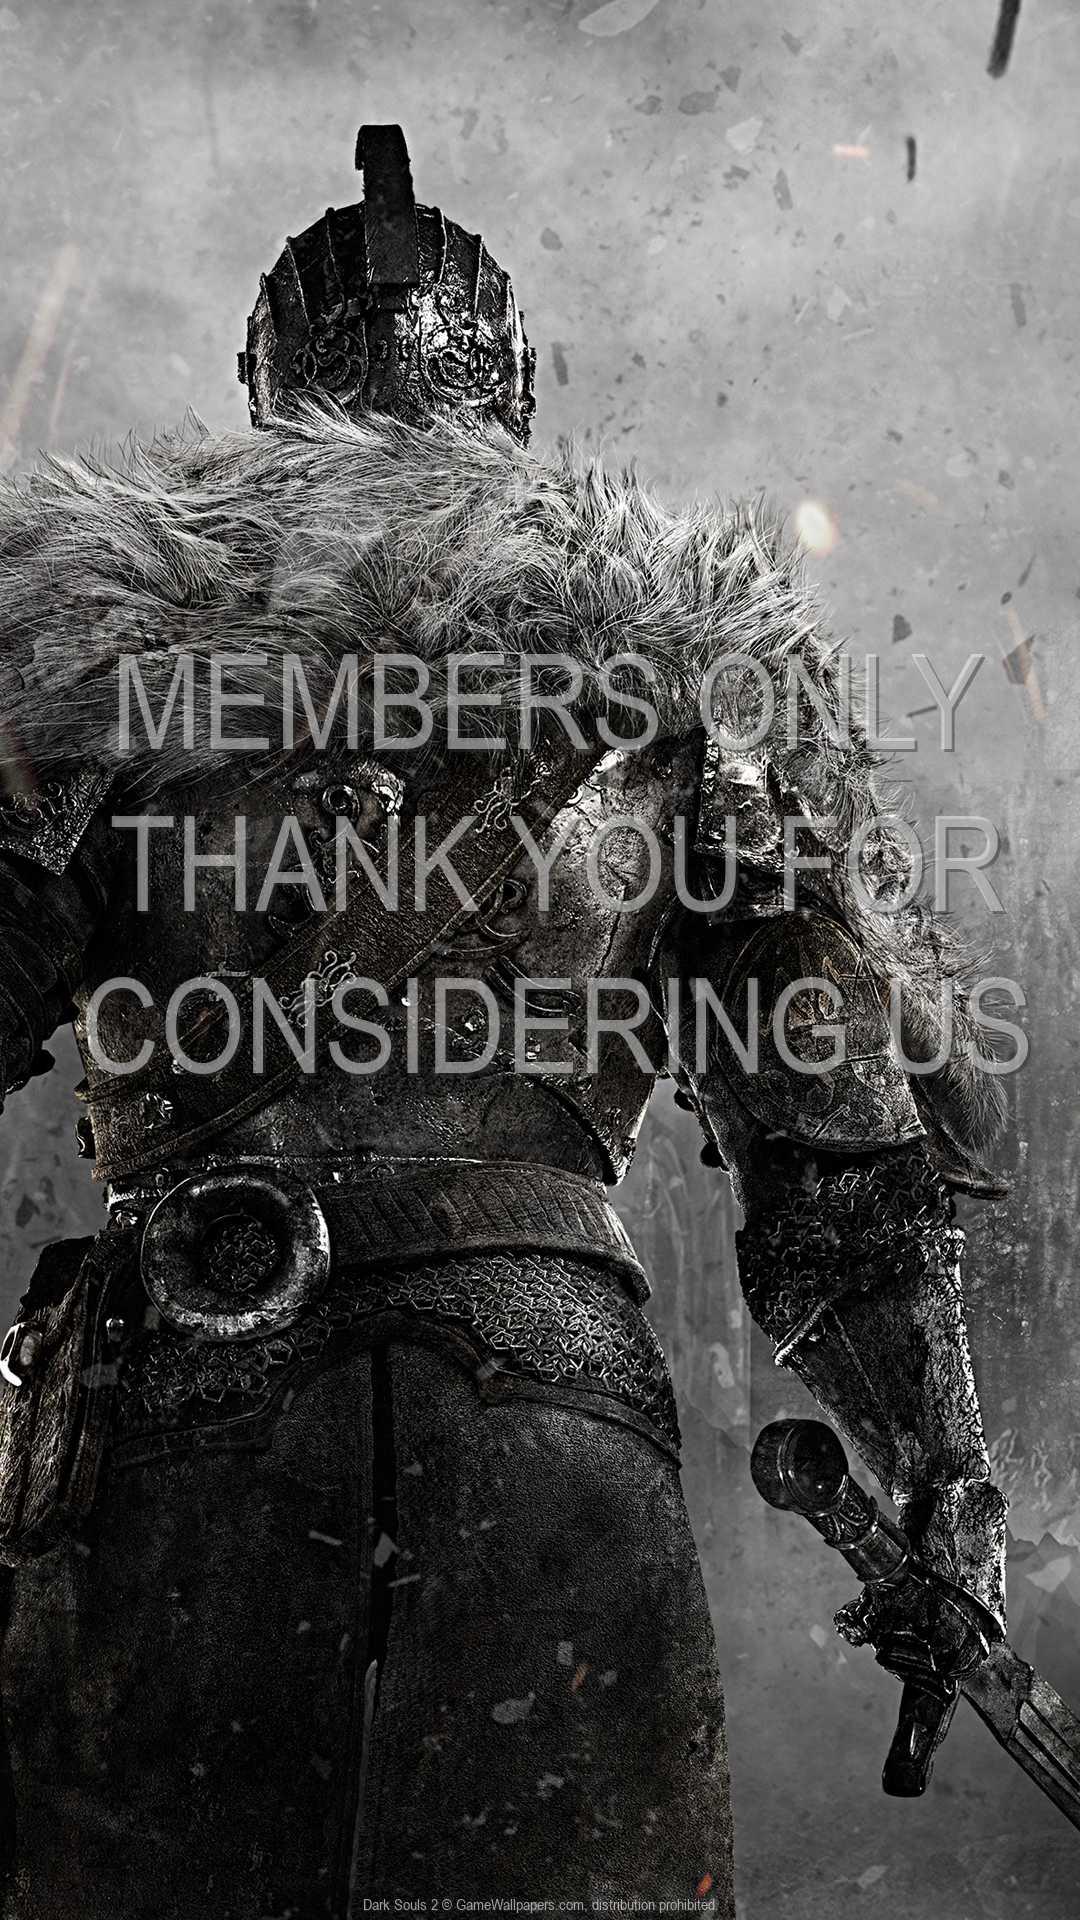 Dark Souls 2 1080p Vertical Handy Hintergrundbild 03